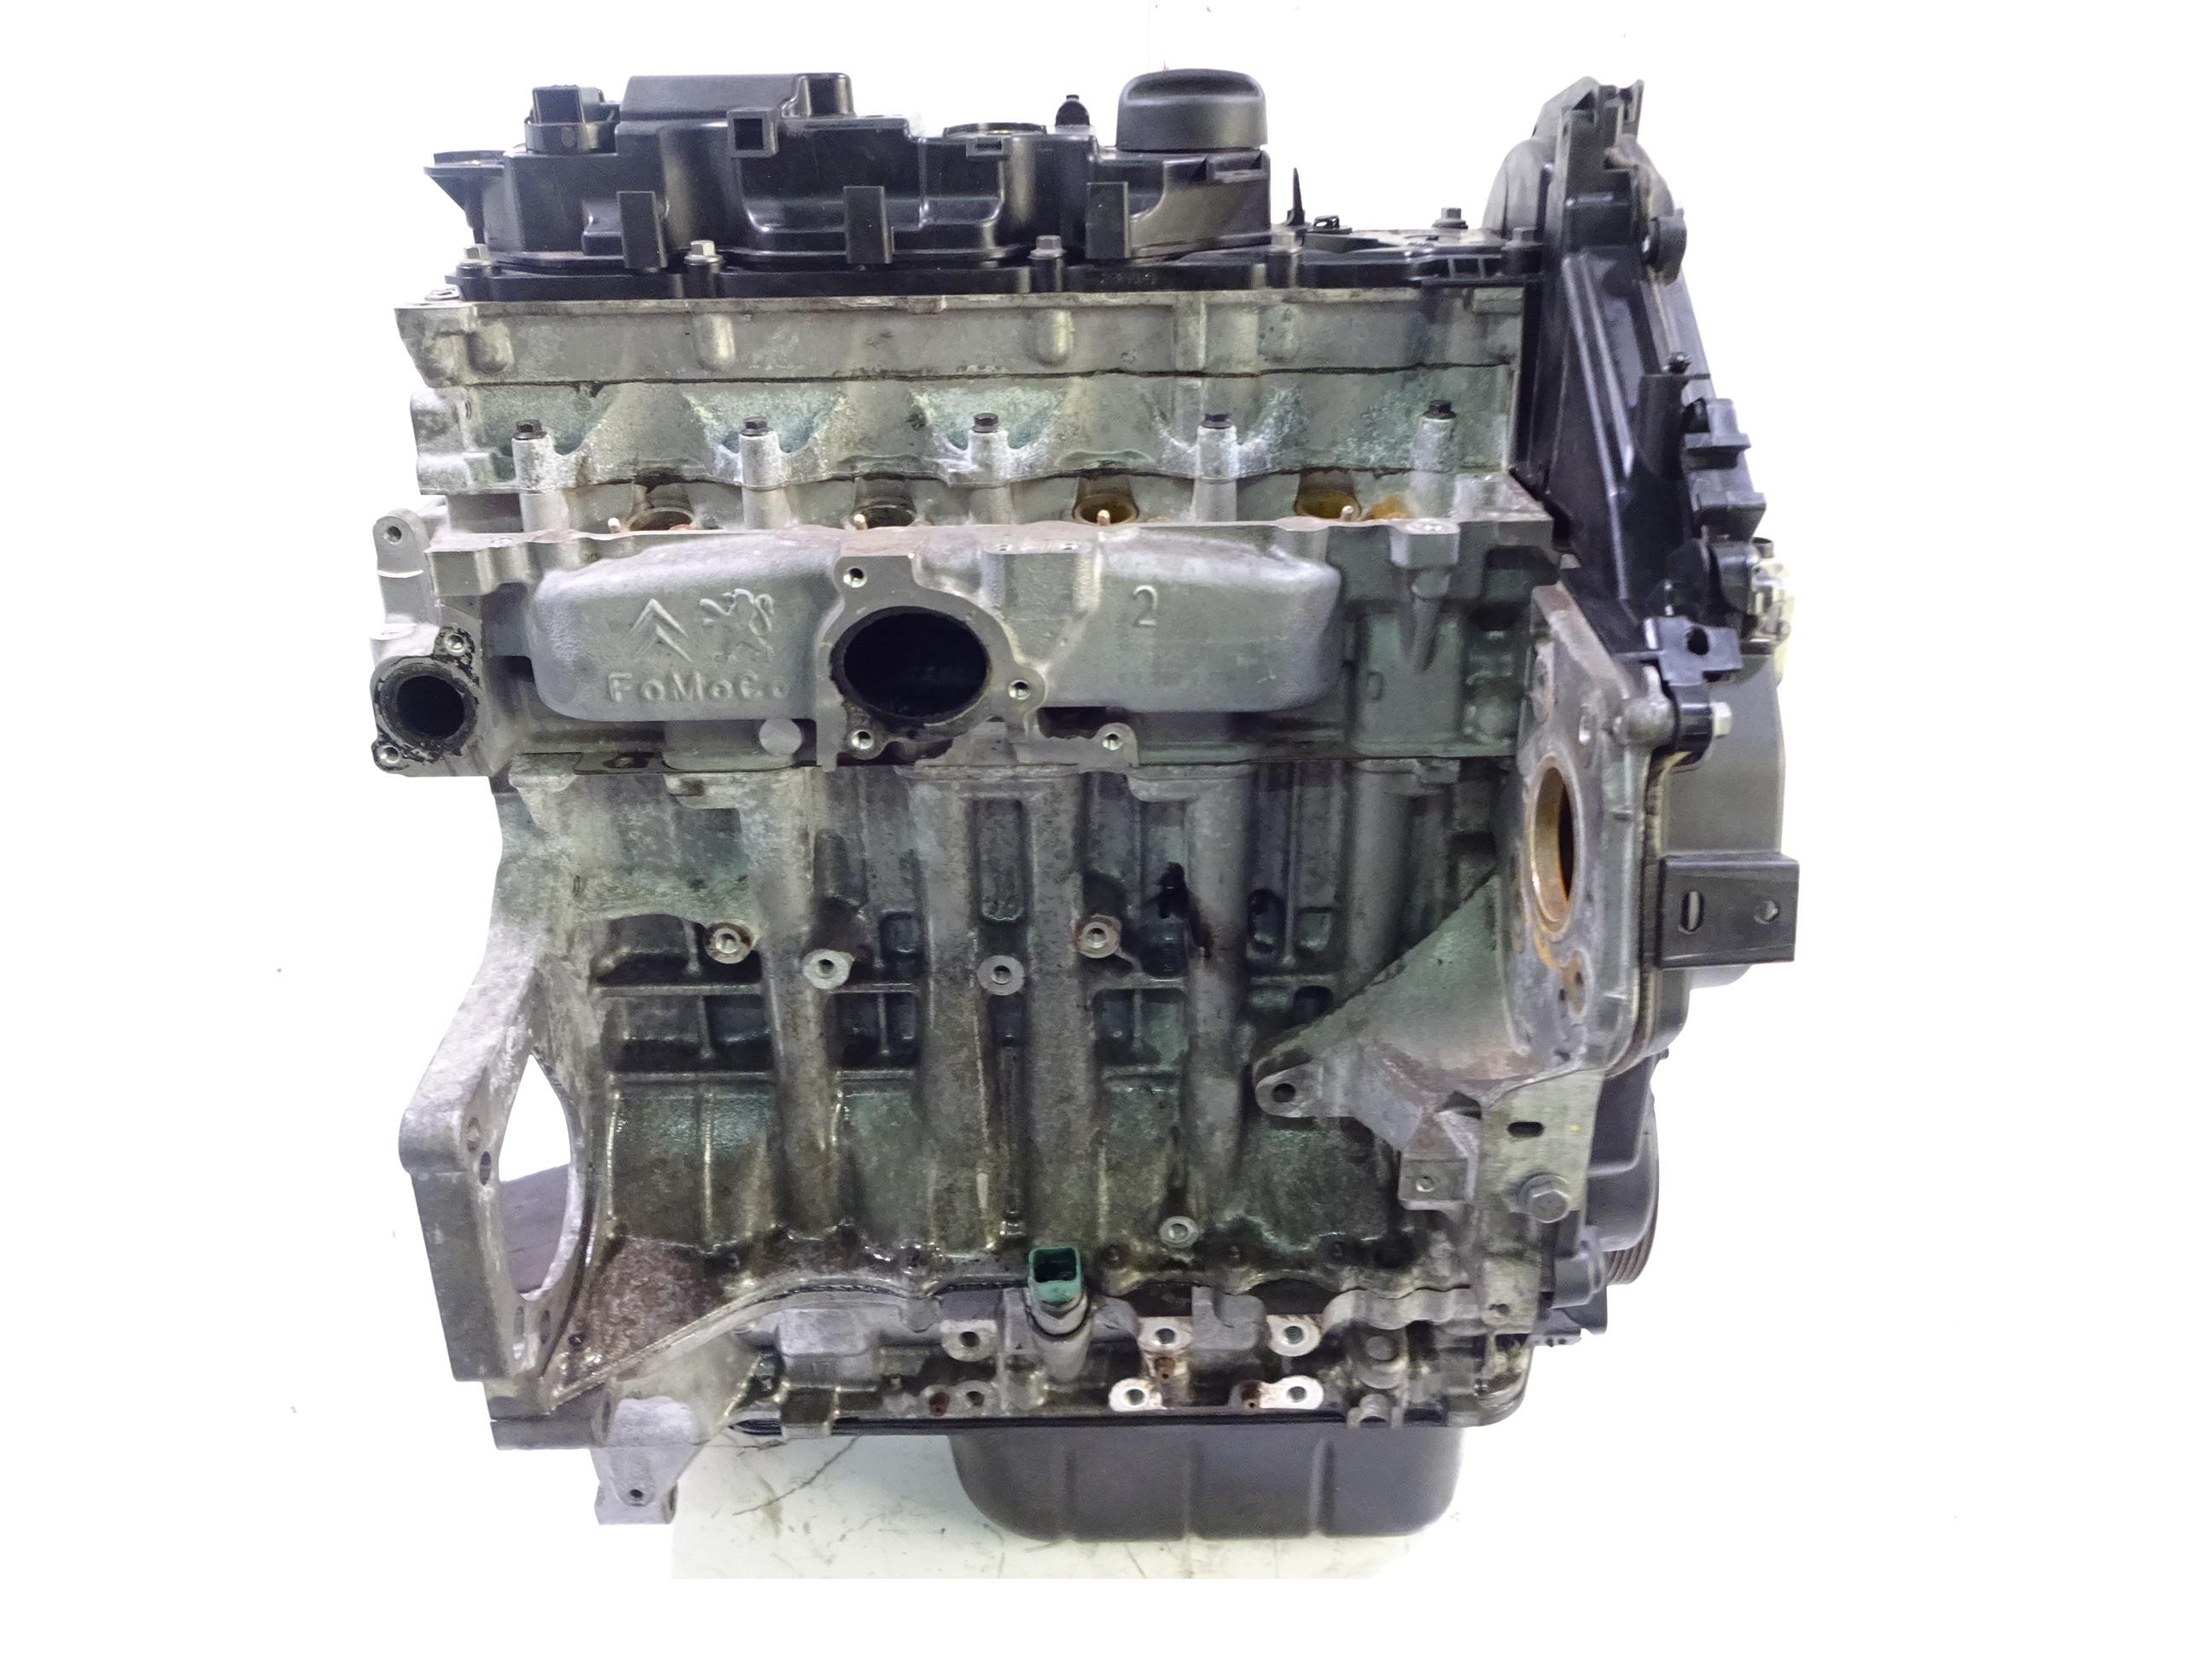 Motor 2012 Citroen DS4 1,6 HDi D Diesel 9HR DV6C 9H05 112 PS